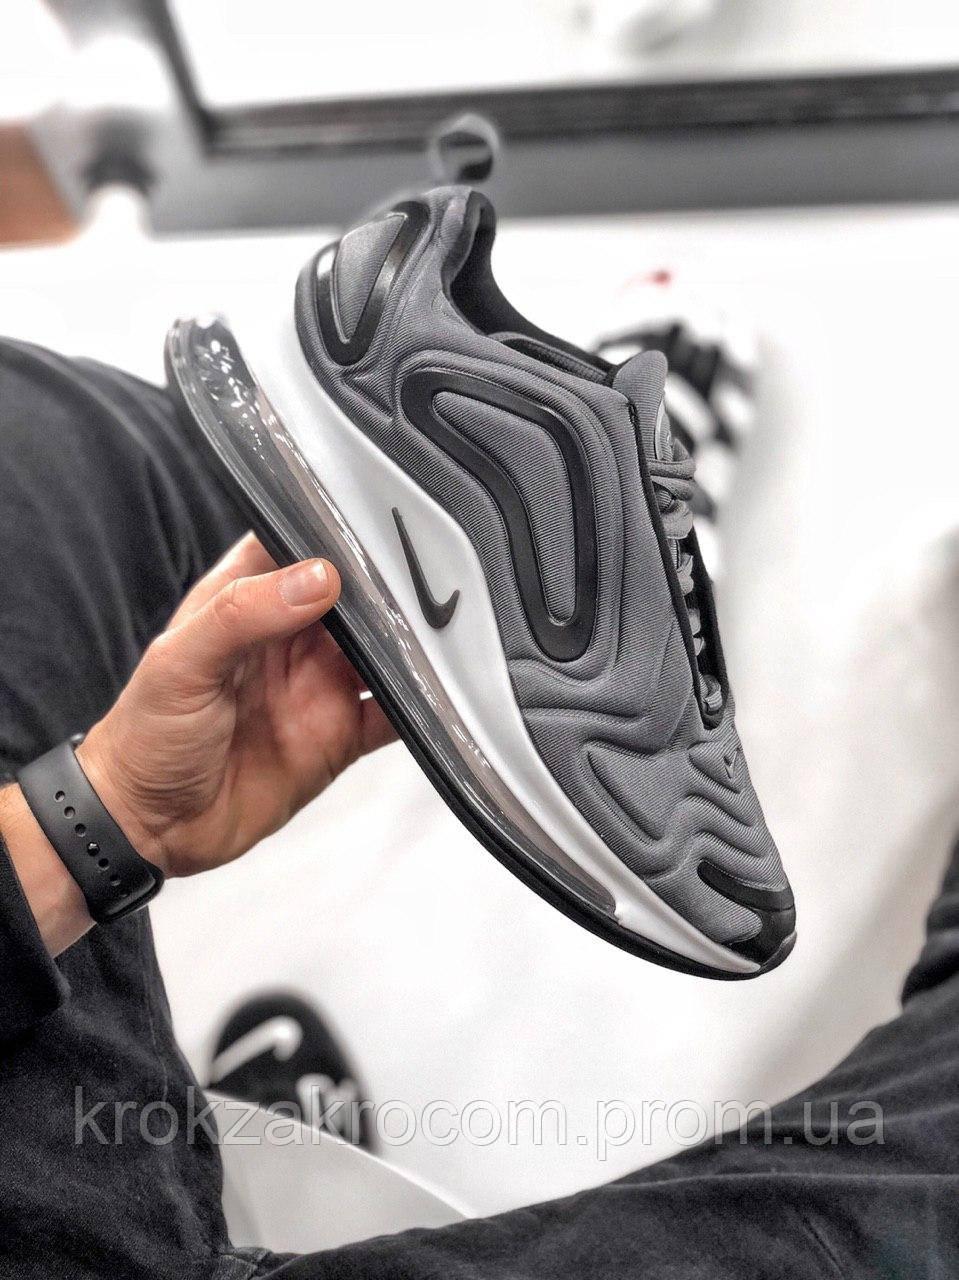 263dc6ed Кроссовки Nike Air Max 720 replica AAA - Интернет-магазин